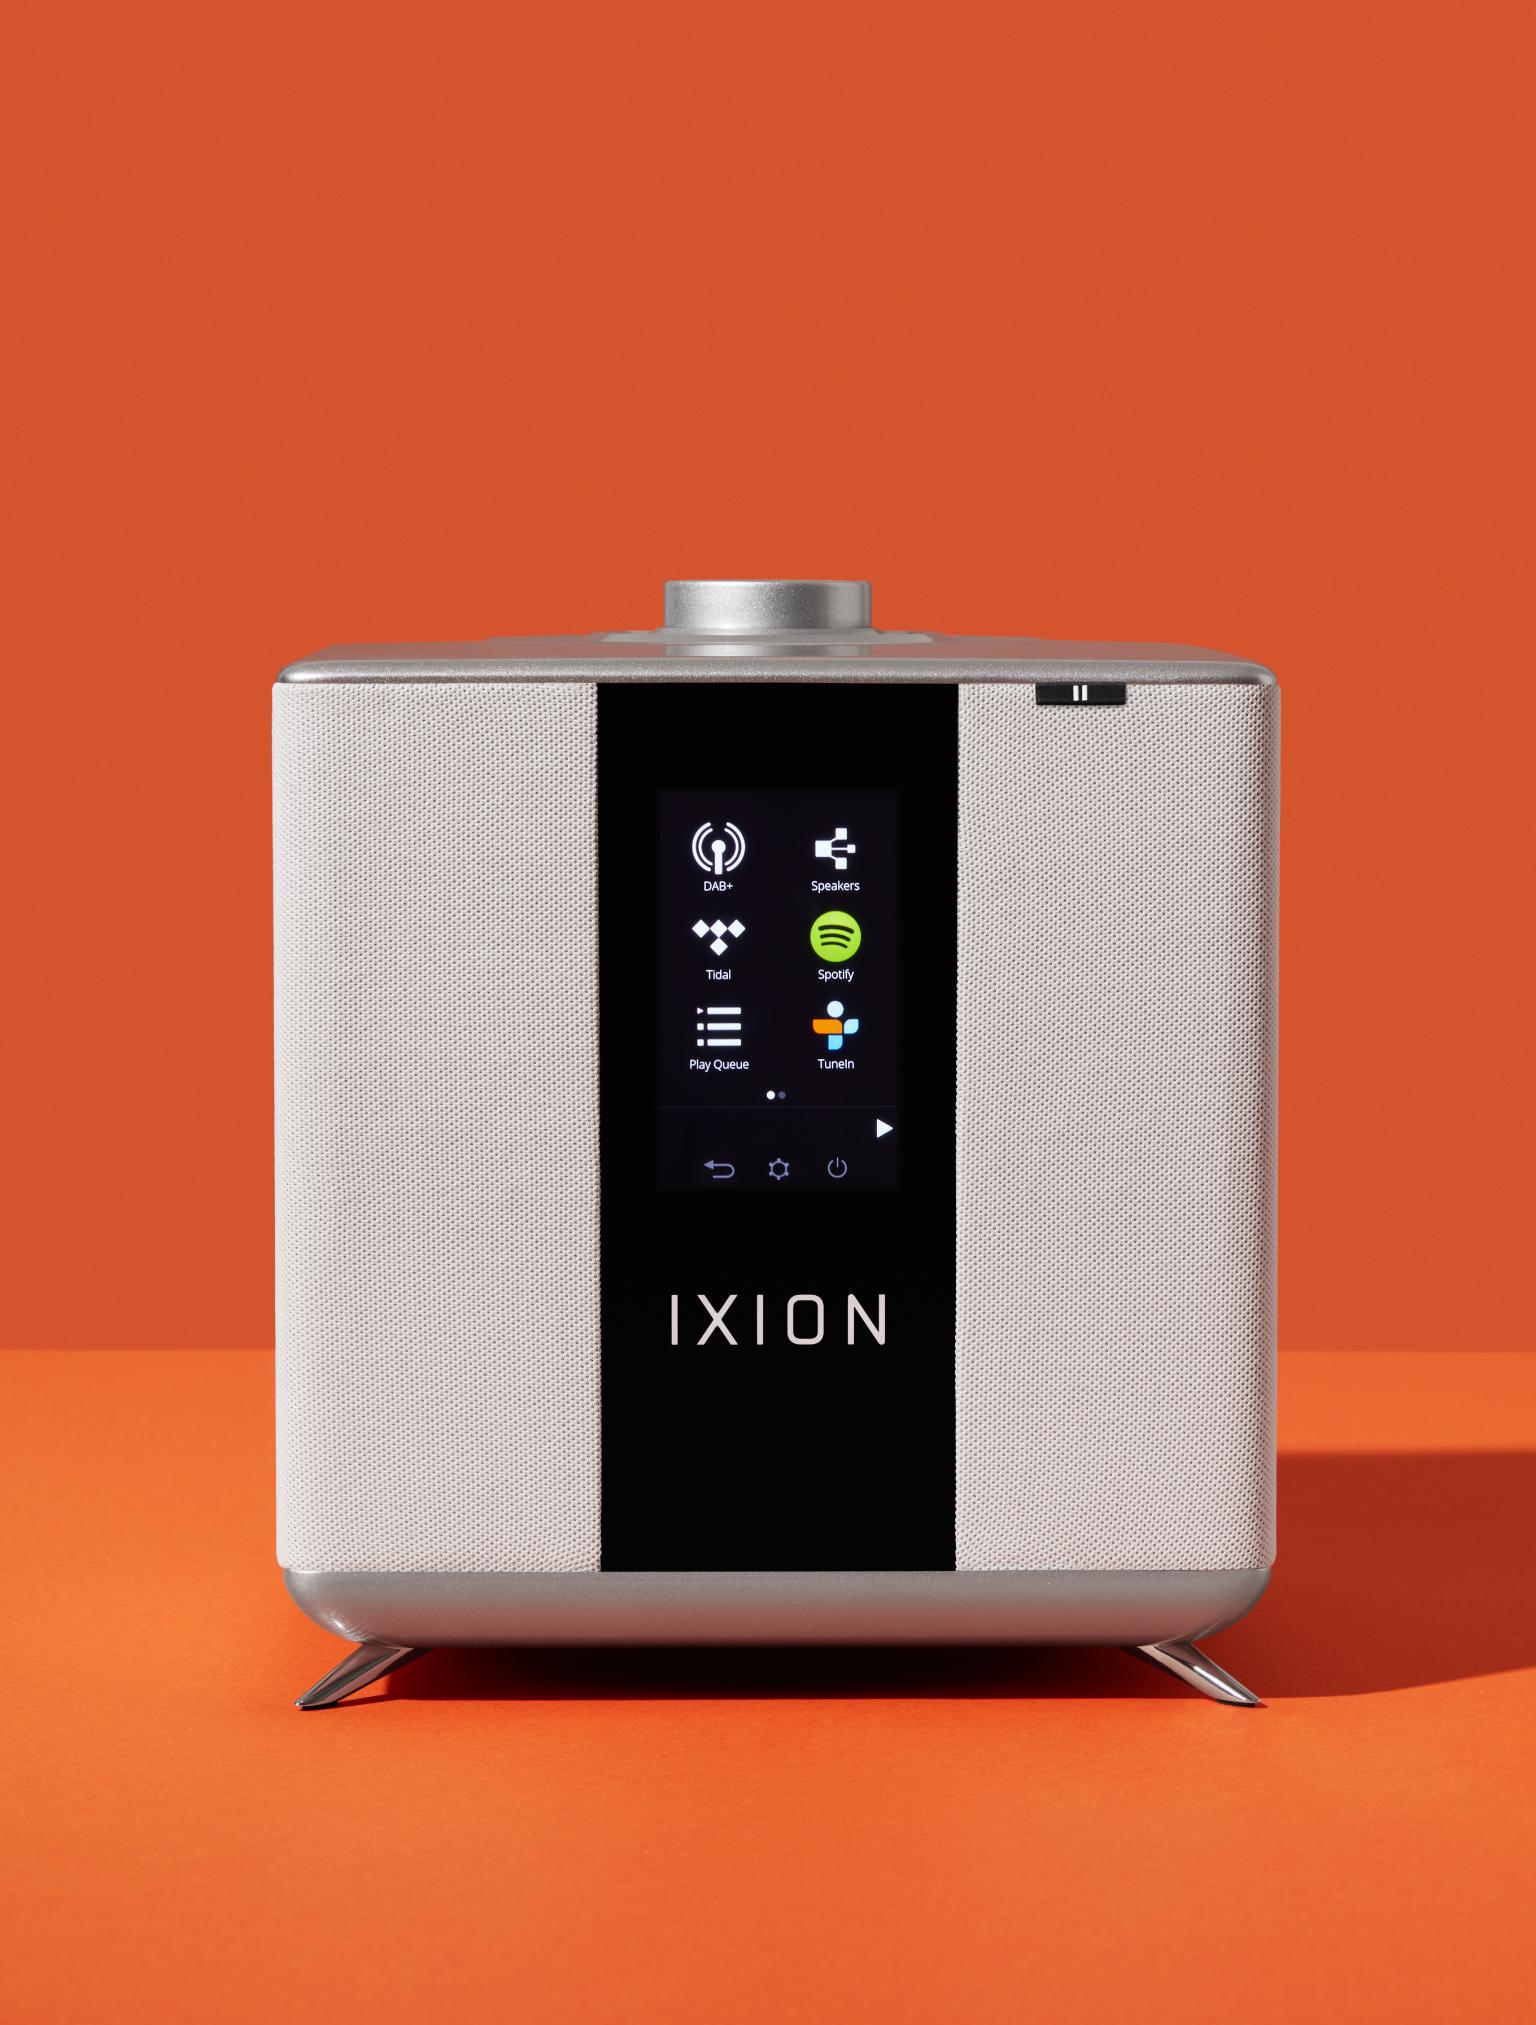 ixion_Maestro_orange_background.png